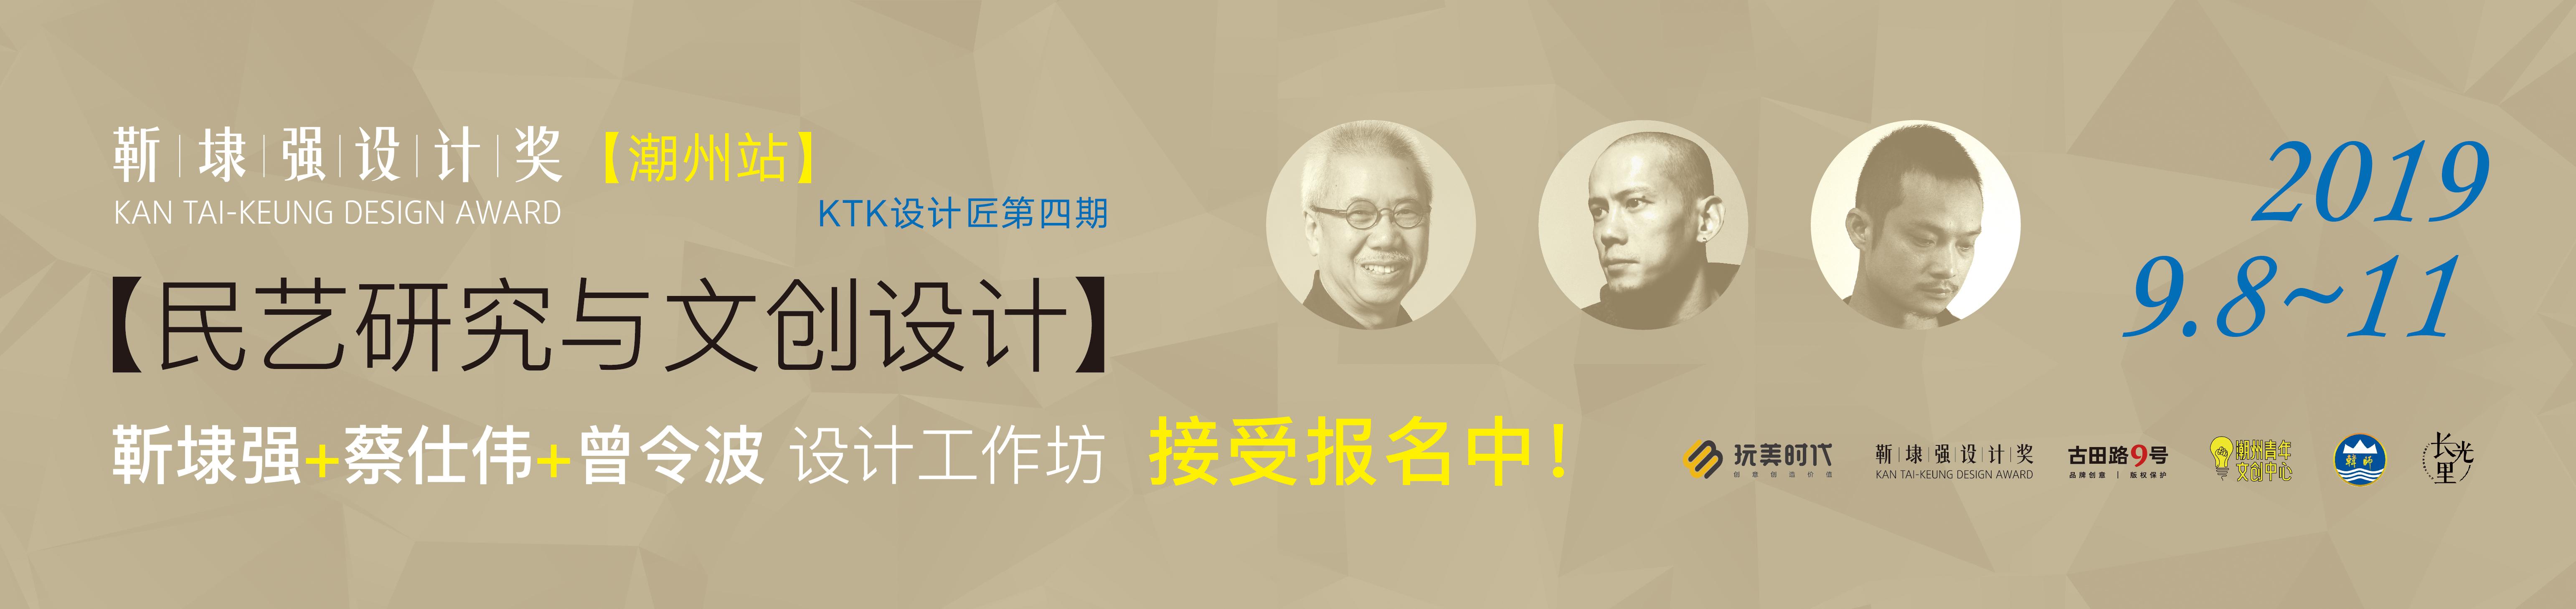 KTK工作坊【民藝研究與文創設計】潮州站 接受報名!